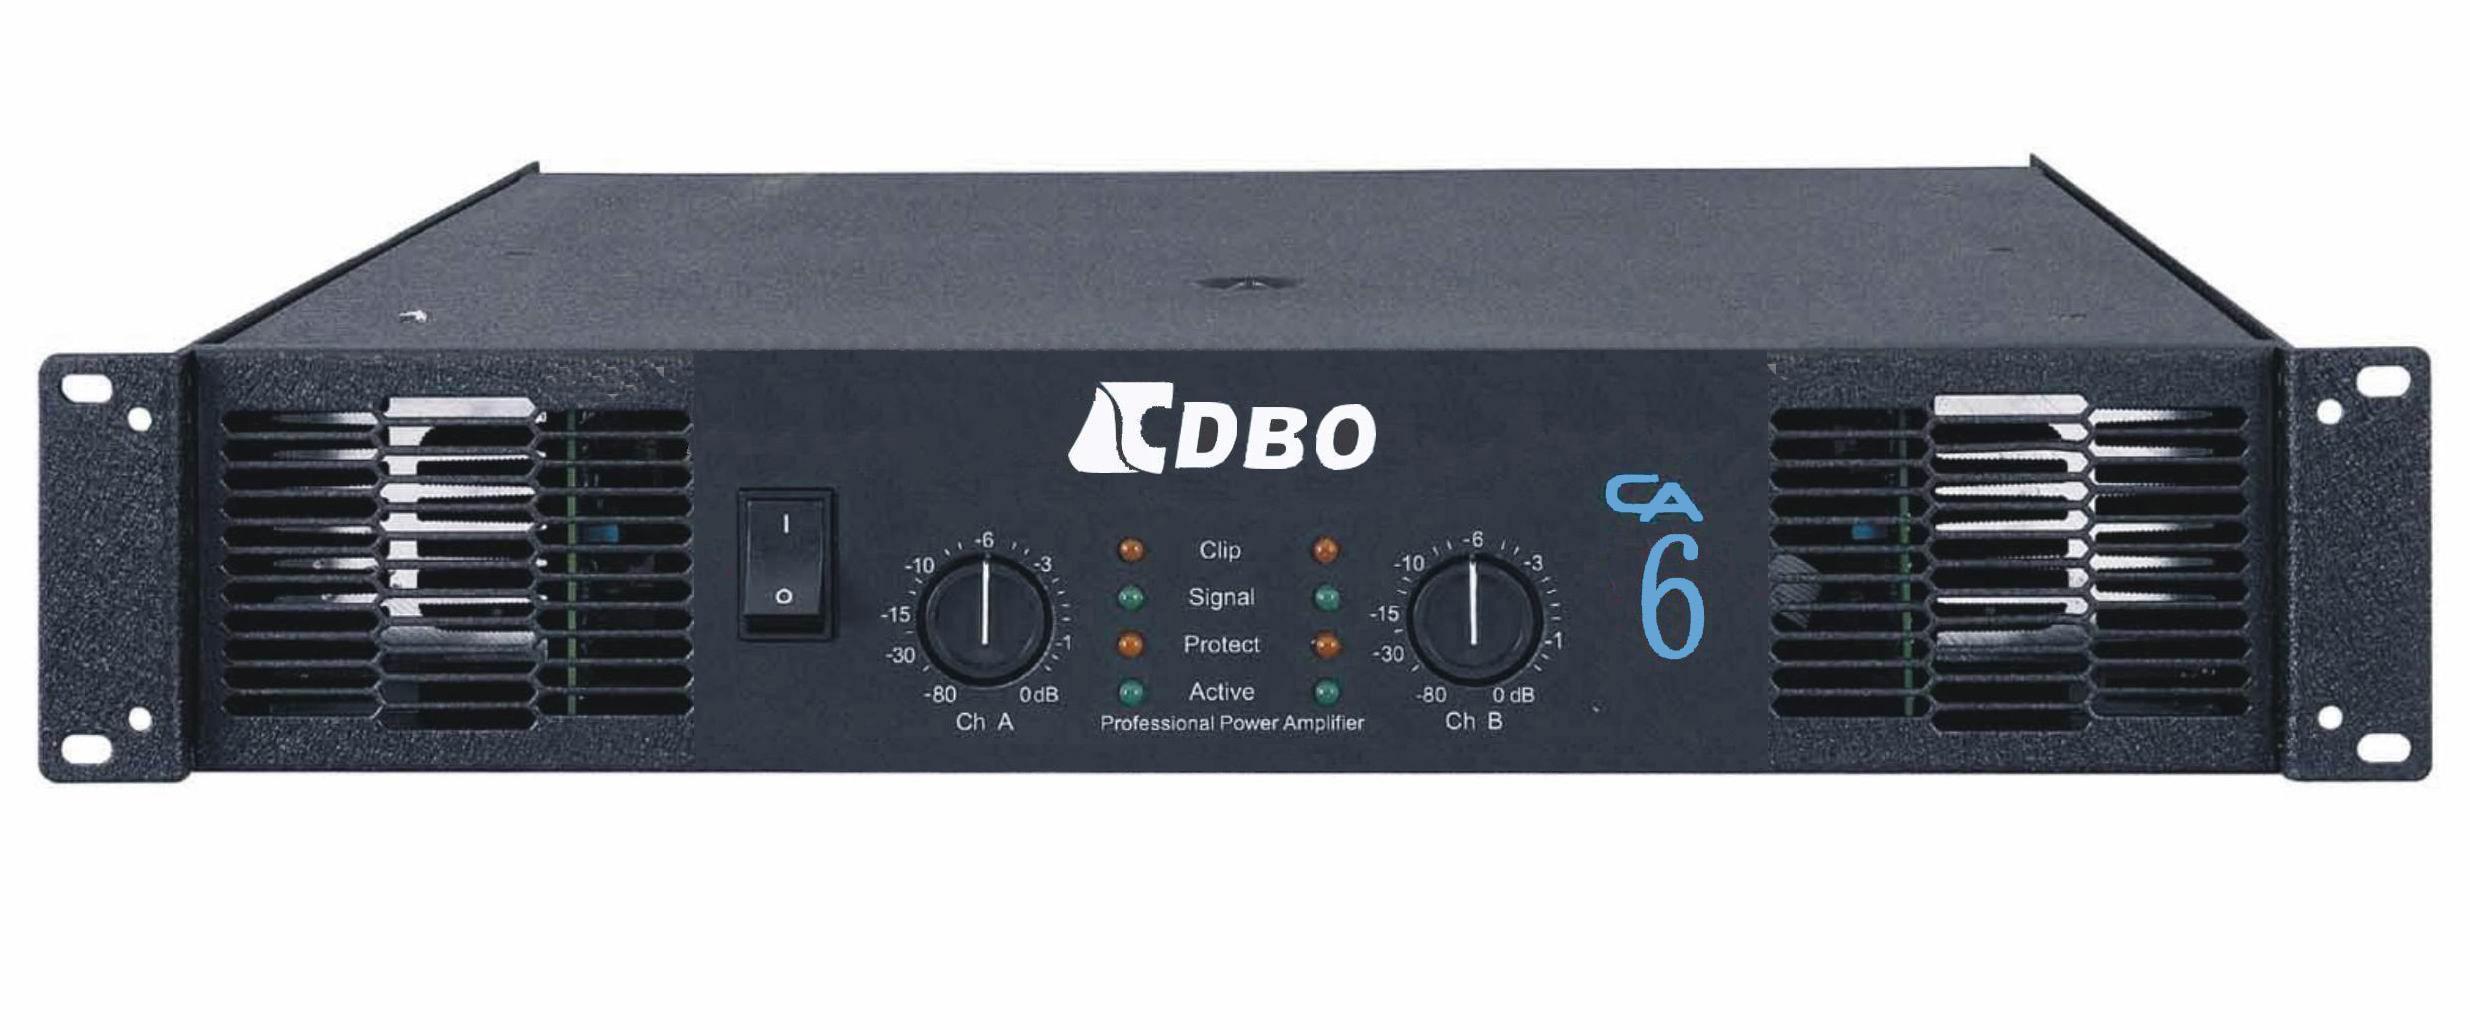 (2U、3U) CA系列功放涵盖了2U-3U的高度和450w-1500w的功率范围。CA系列追求的是更快的反应速度,增加了点子压线路和电路桥接的线路。SMT的生产技术,精良的元器件。CA系列的功放都可以承受立体声2,桥接4的负载,适合驱动线性系列的扬声系统。CA系列适合大型流动演出、乐队表演、DISCO、夜总会等场合。